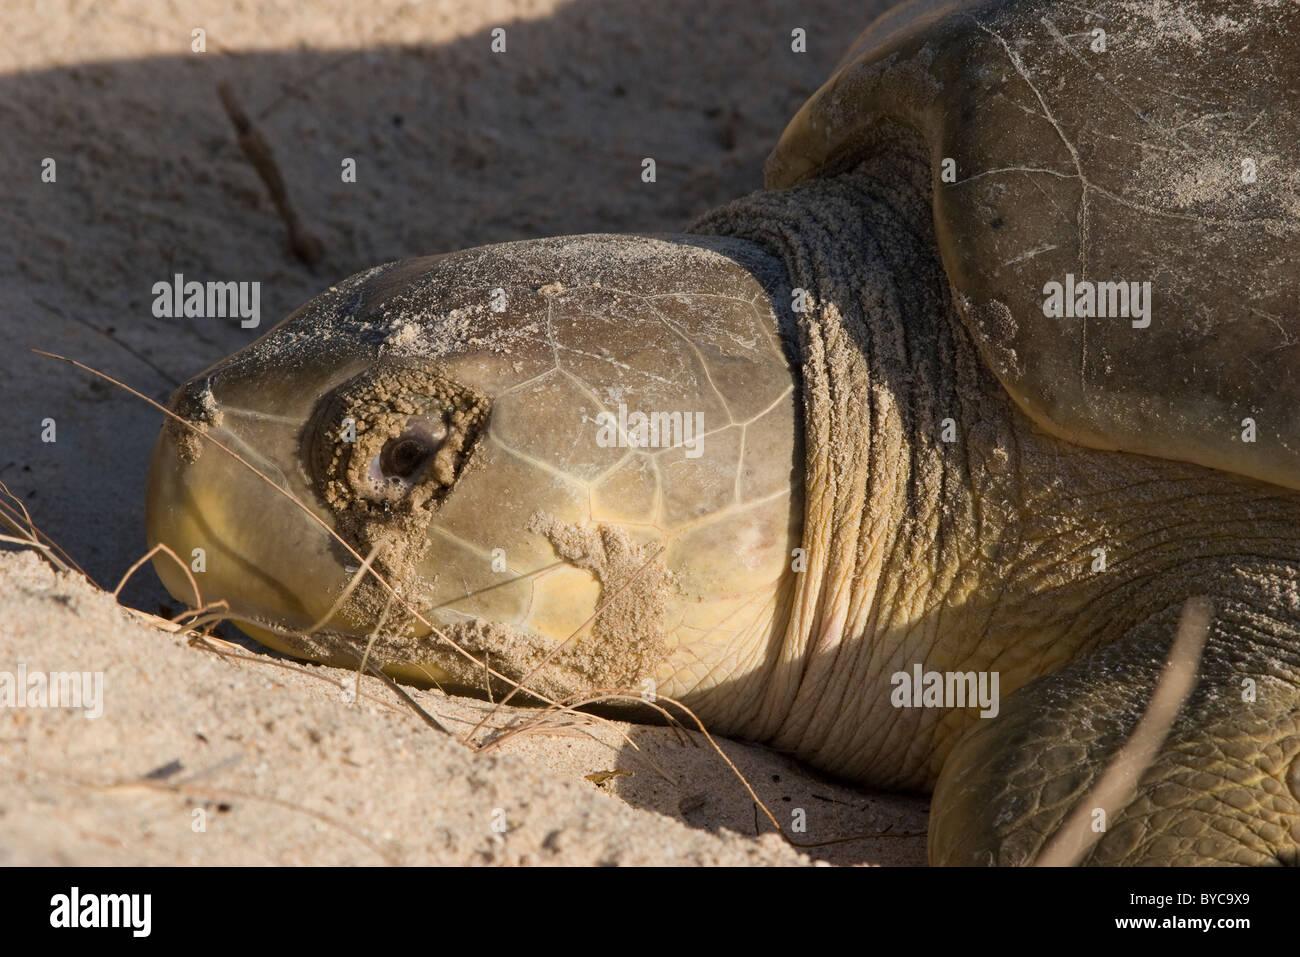 Australian flatback sea turtle ( Natator depressus ) nesting female with tears (excretions from salt glands), Crab Stock Photo